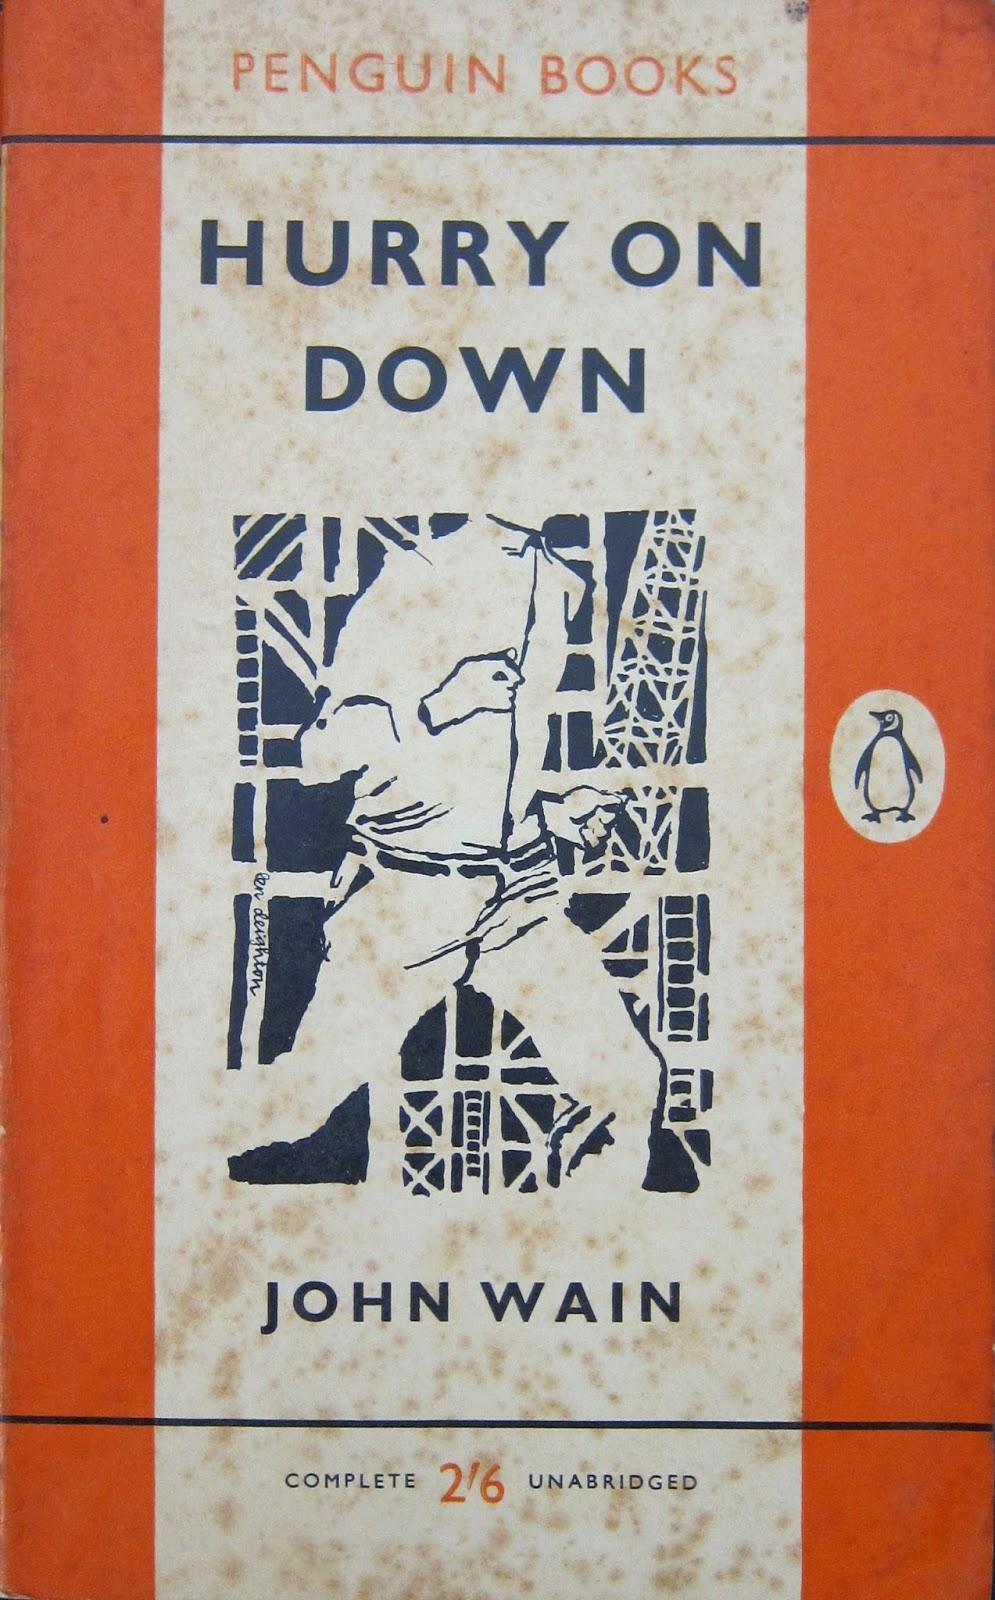 Penguin Book Cover Questions : Vintage penguins covers by len deighton